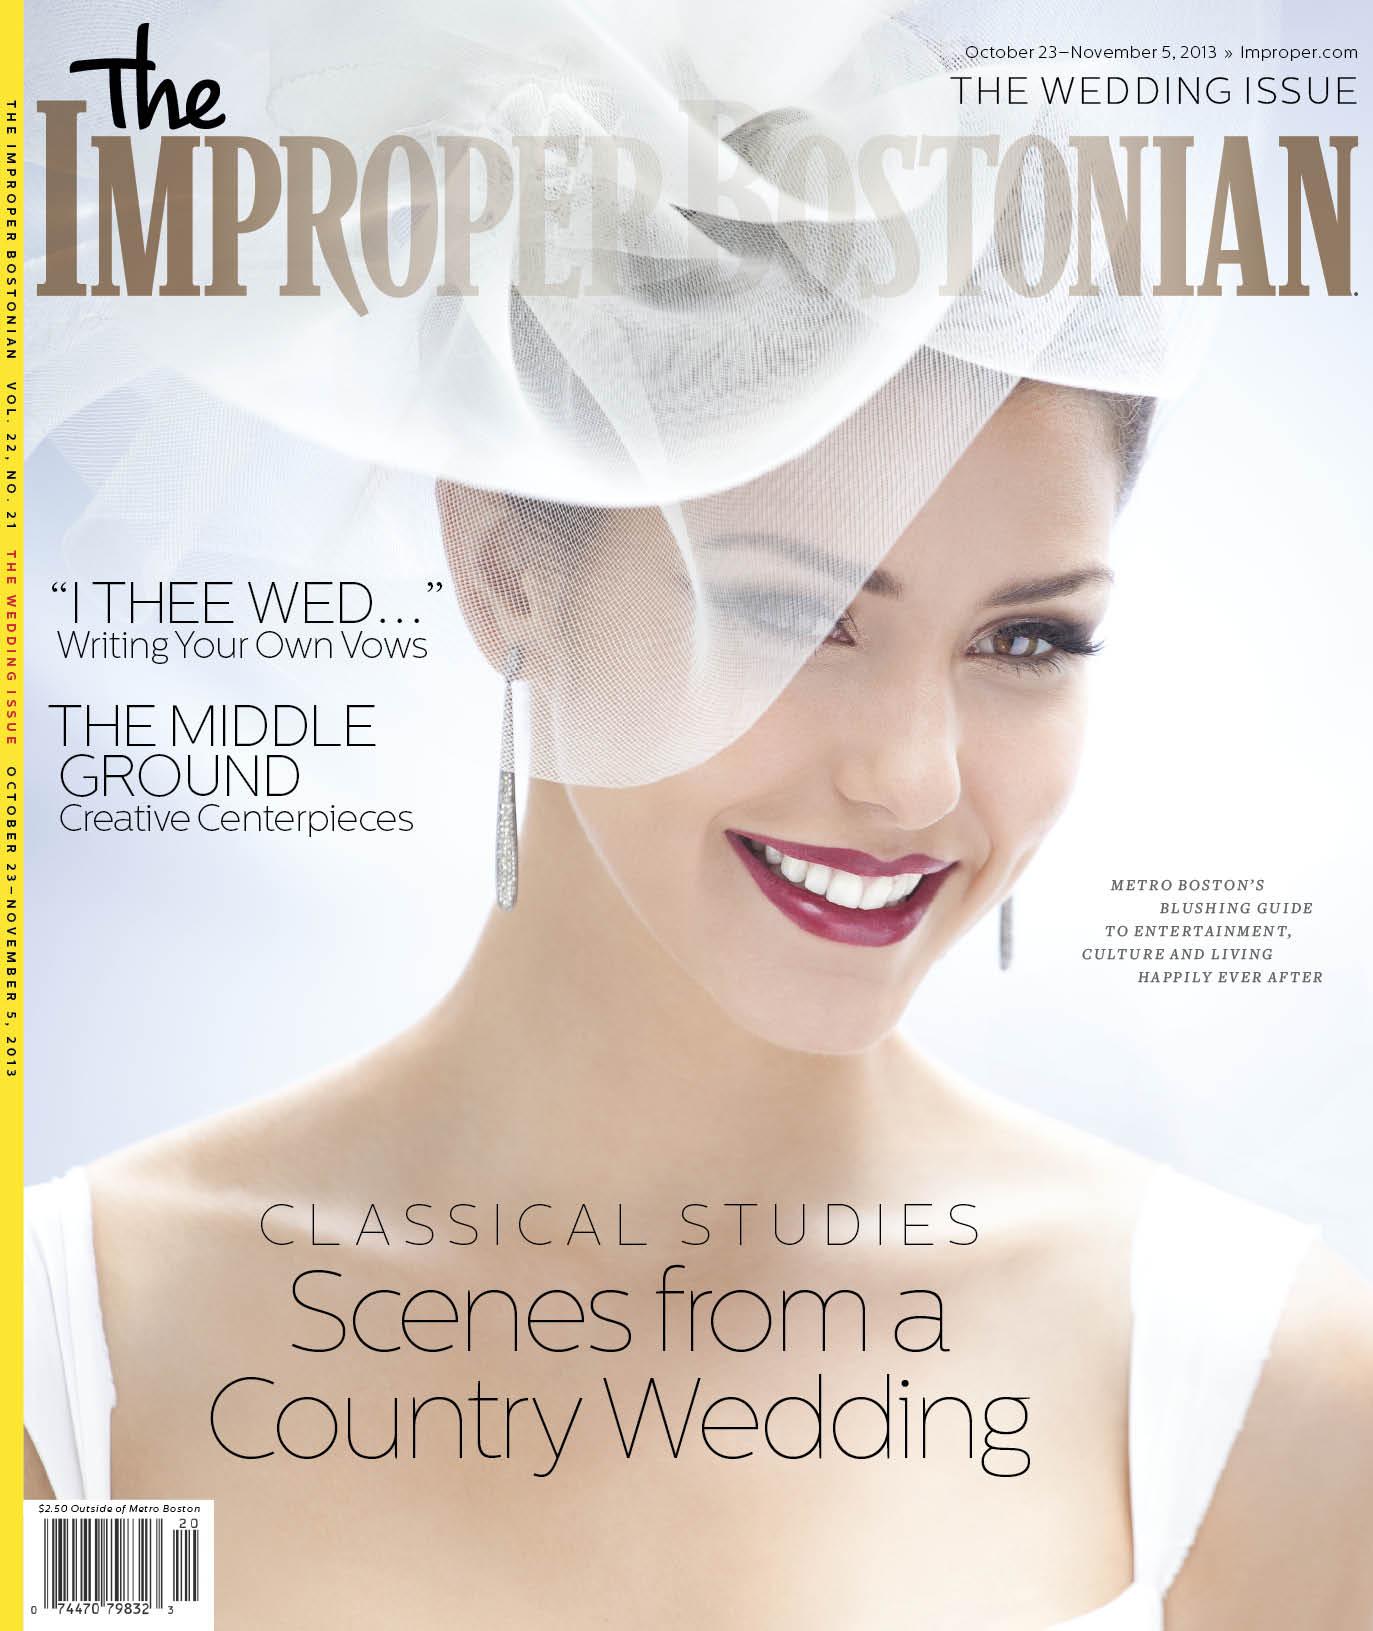 Improper Wedding Issue 2013 Ceremony Boston